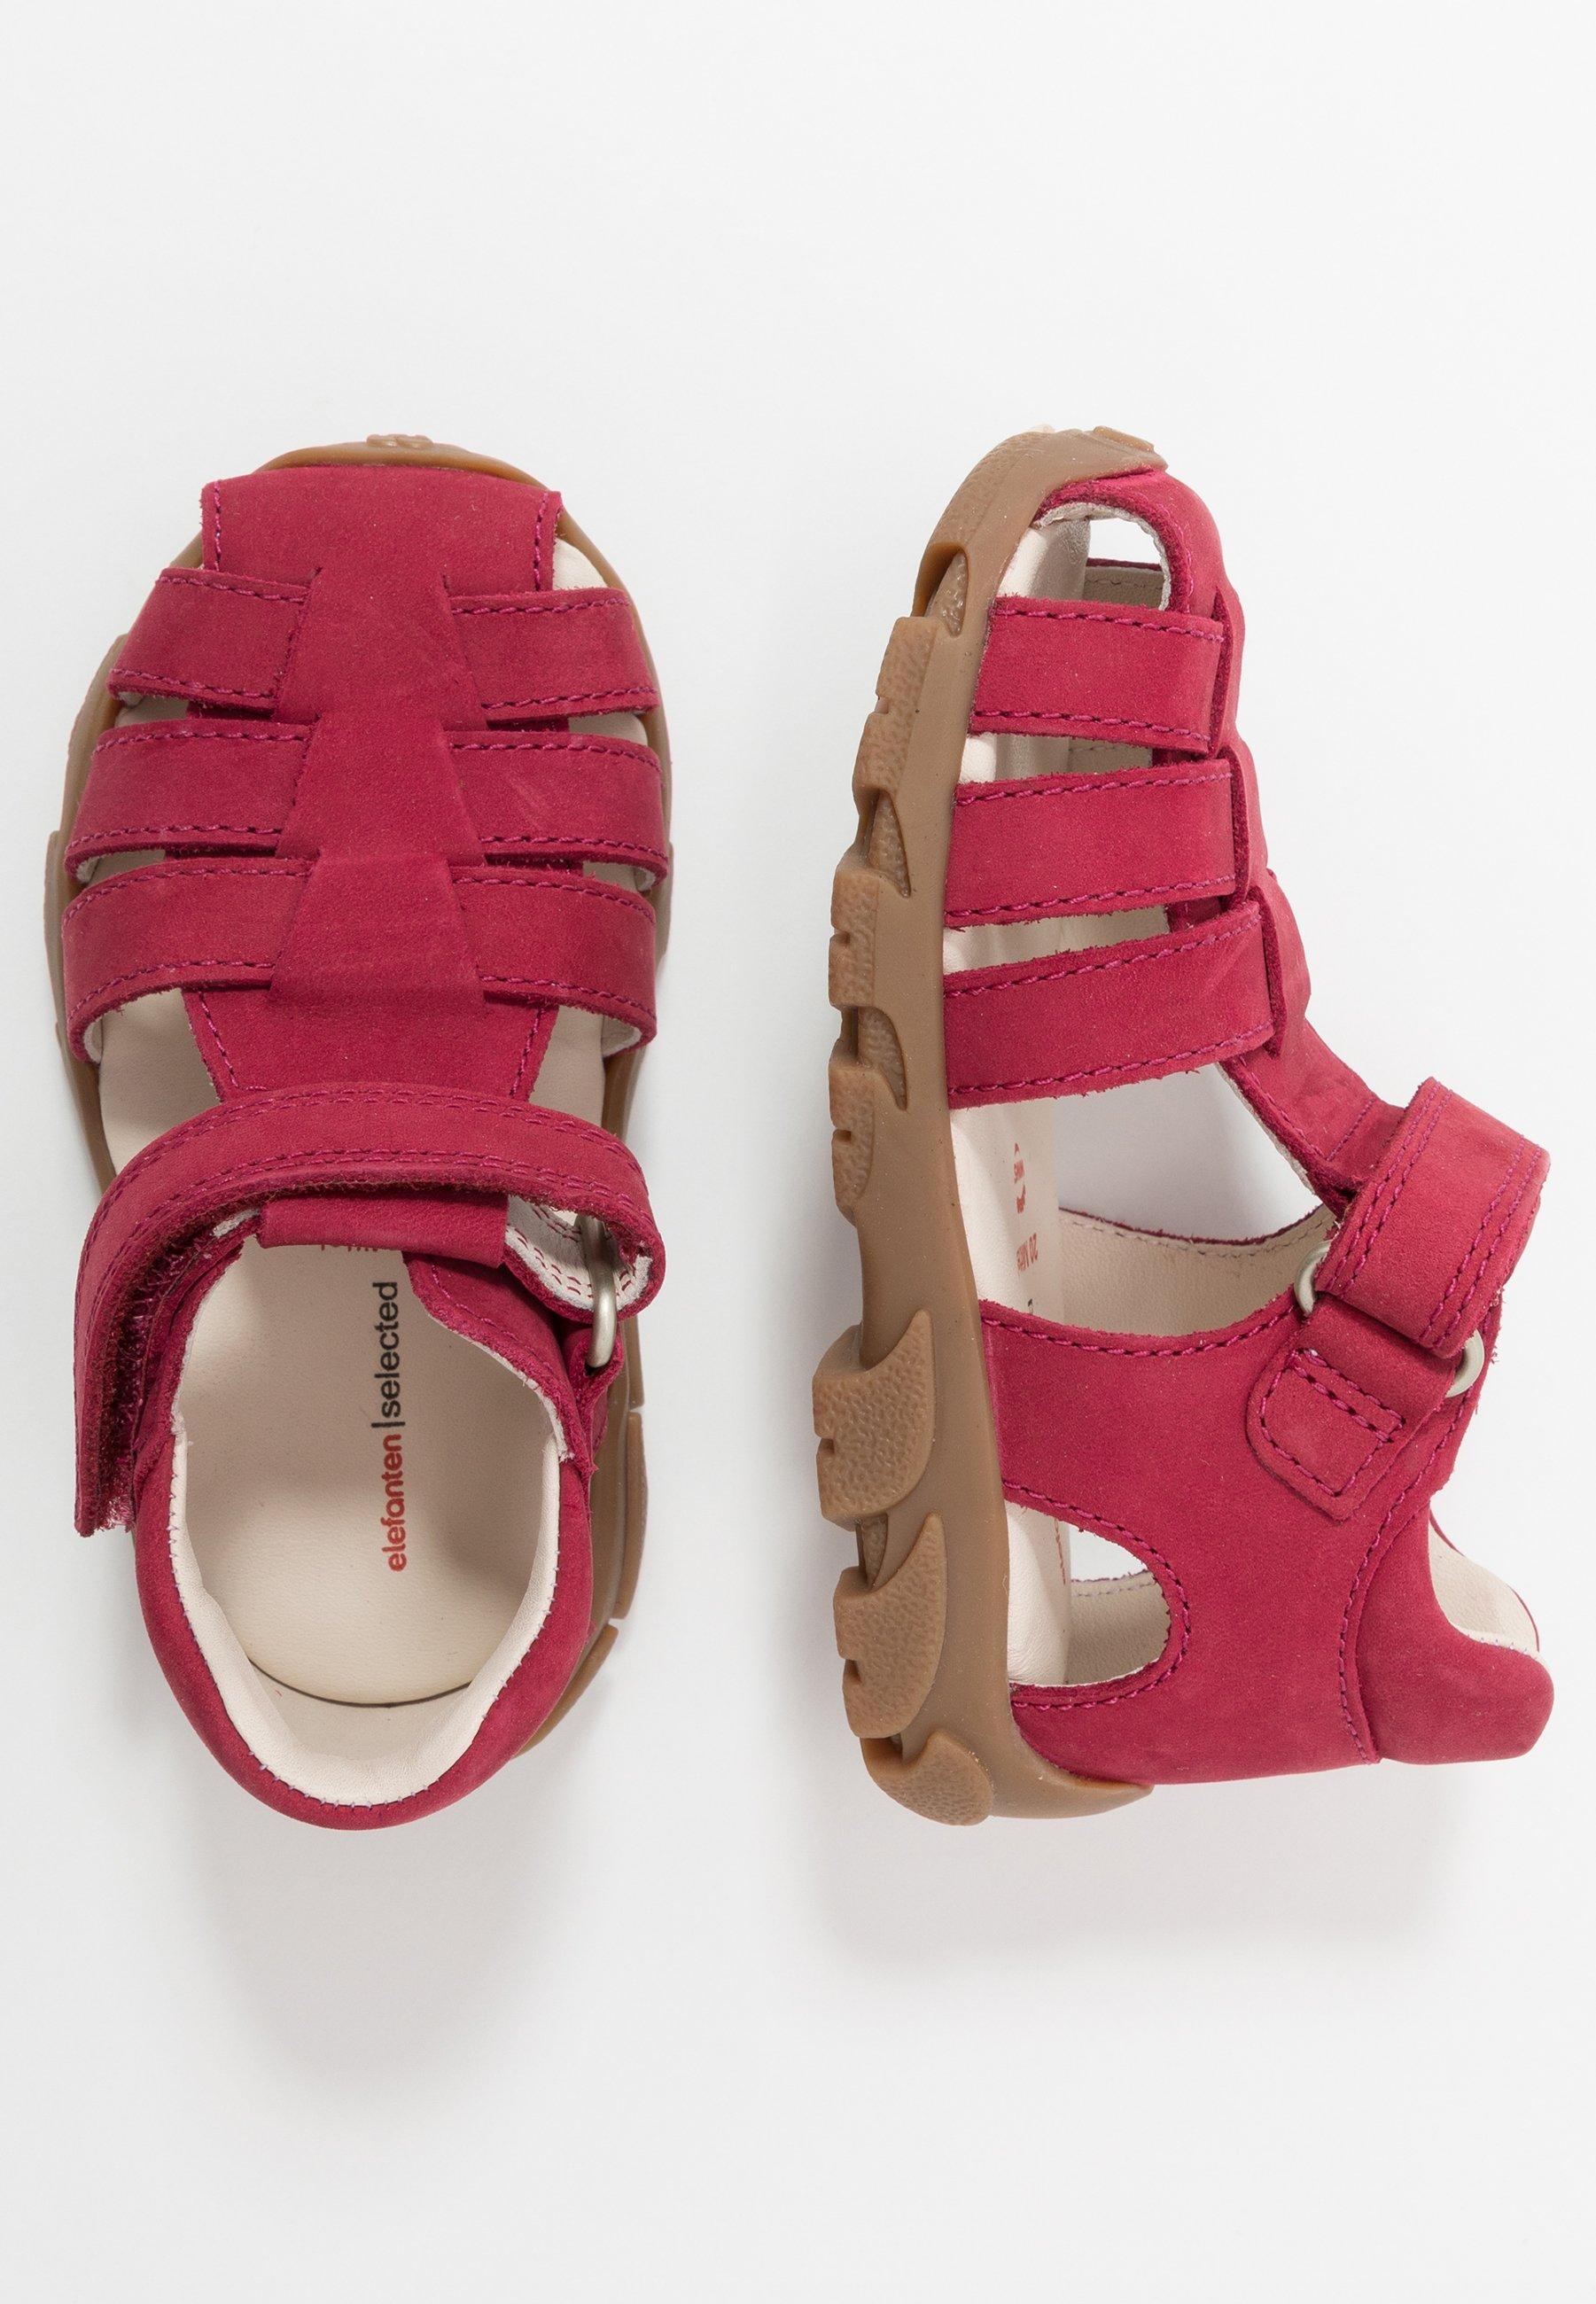 Elefanten Fido Baby Shoes Burgundy Red Red Zalando Co Uk